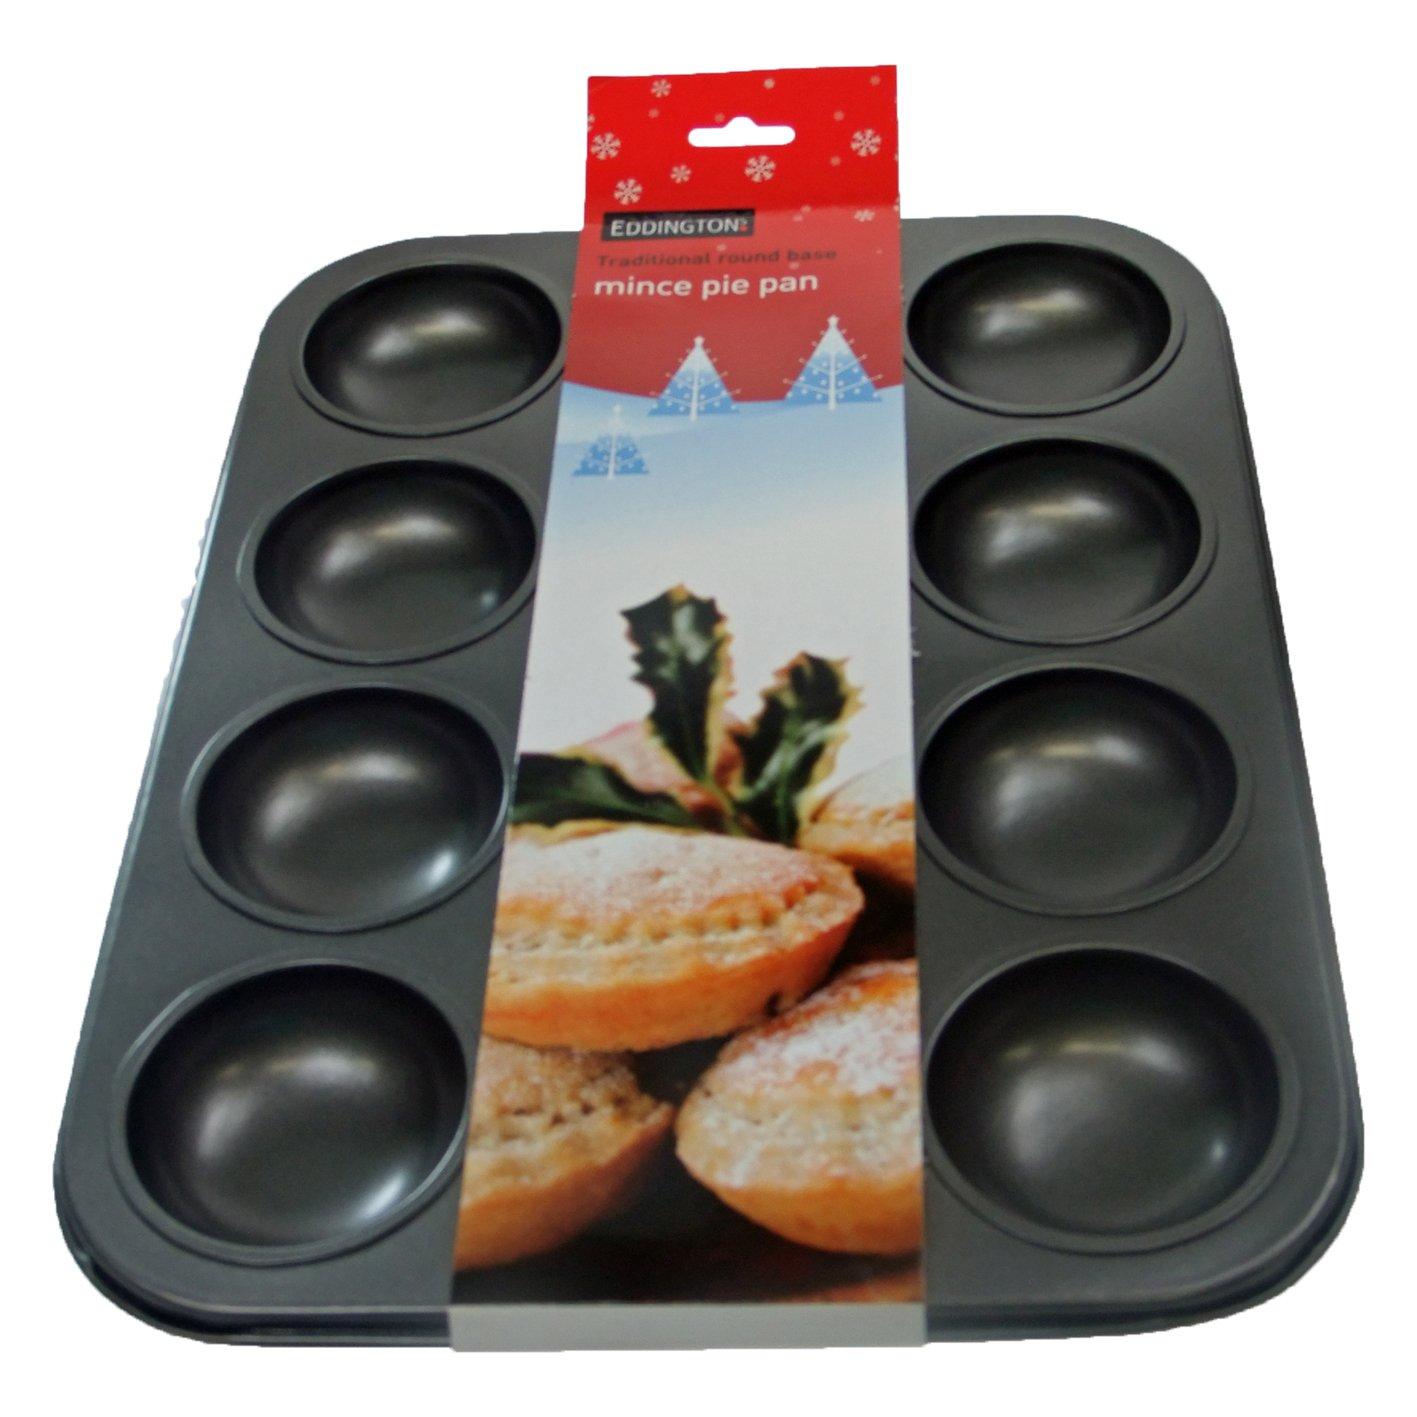 12 Hole Mince Pie Baking Pan by Eddingtons